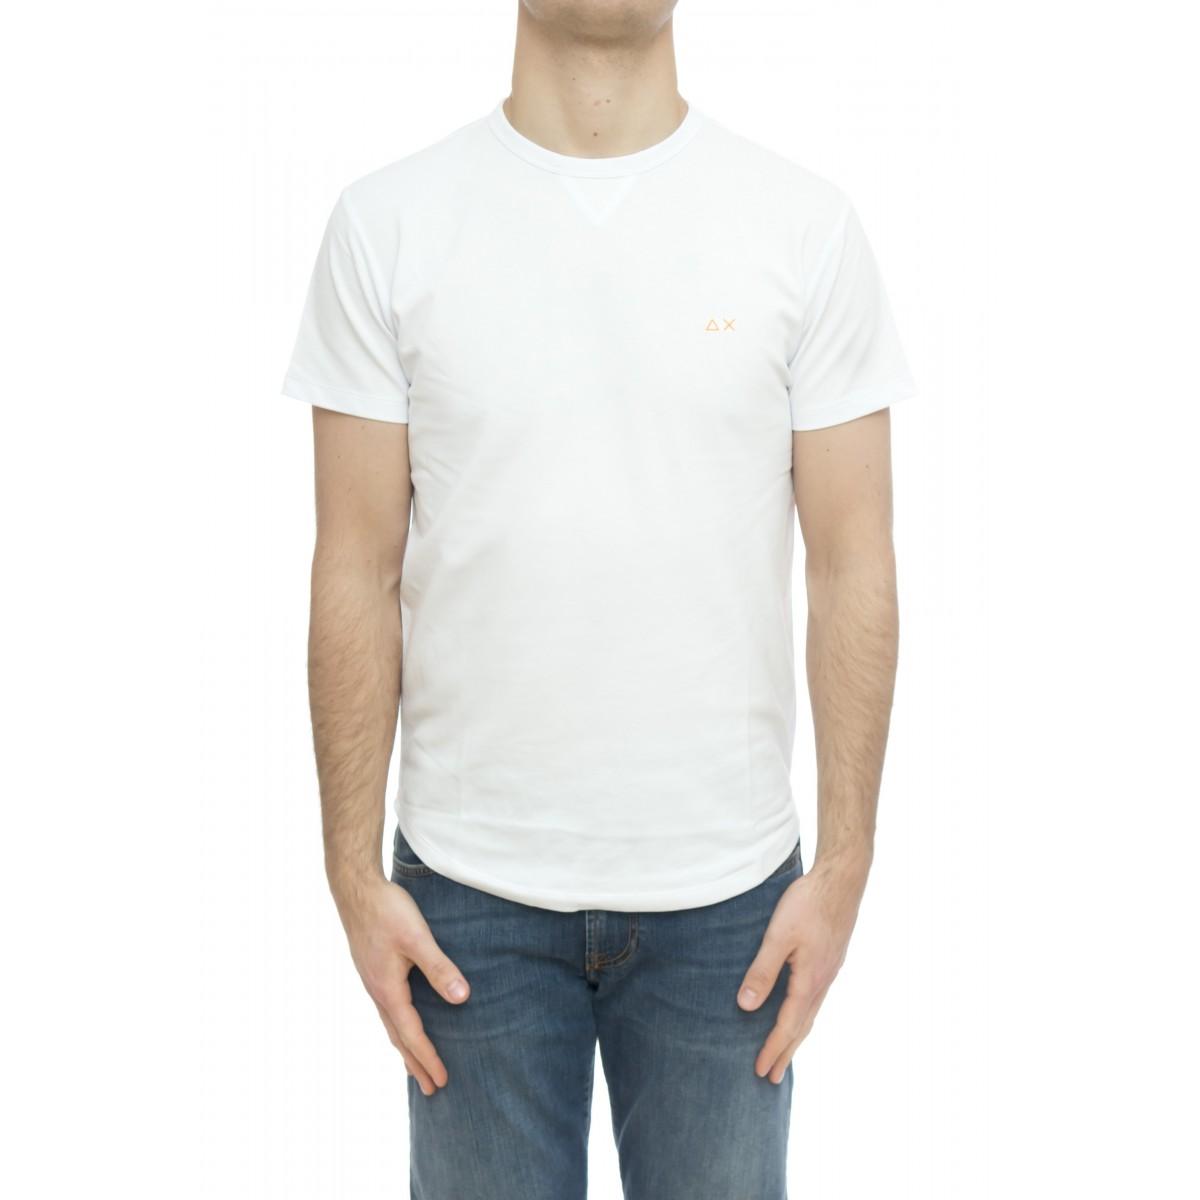 T-shirt - T30113 t-shirt nido ape